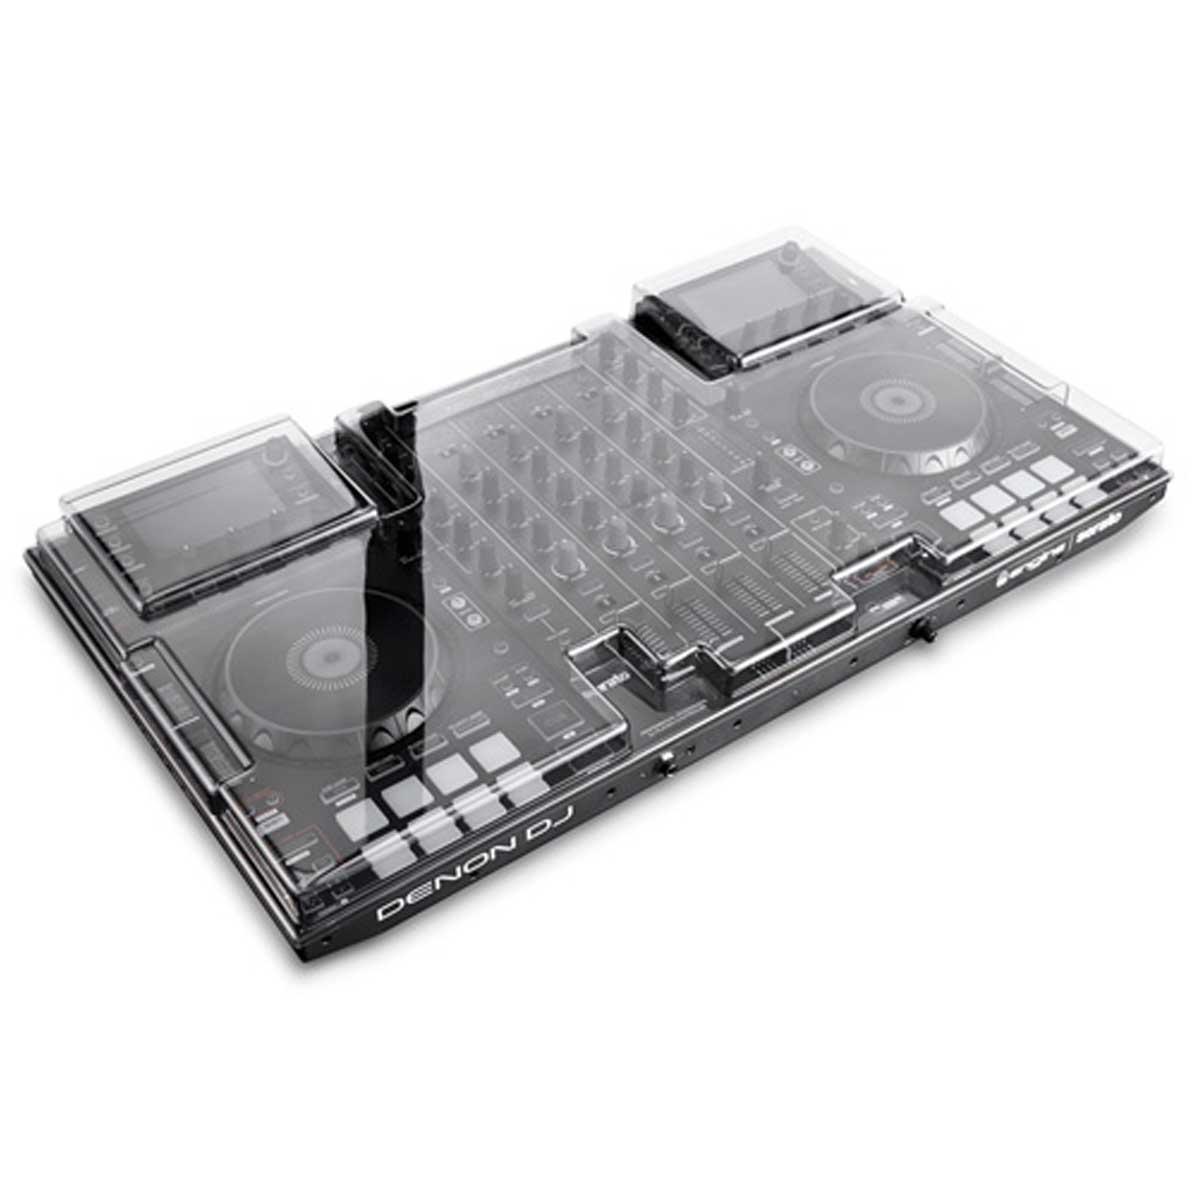 Decksaver デッキセーバー / DS-PC-MCX8000 MCX8000用保護カバー【お取り寄せ商品】